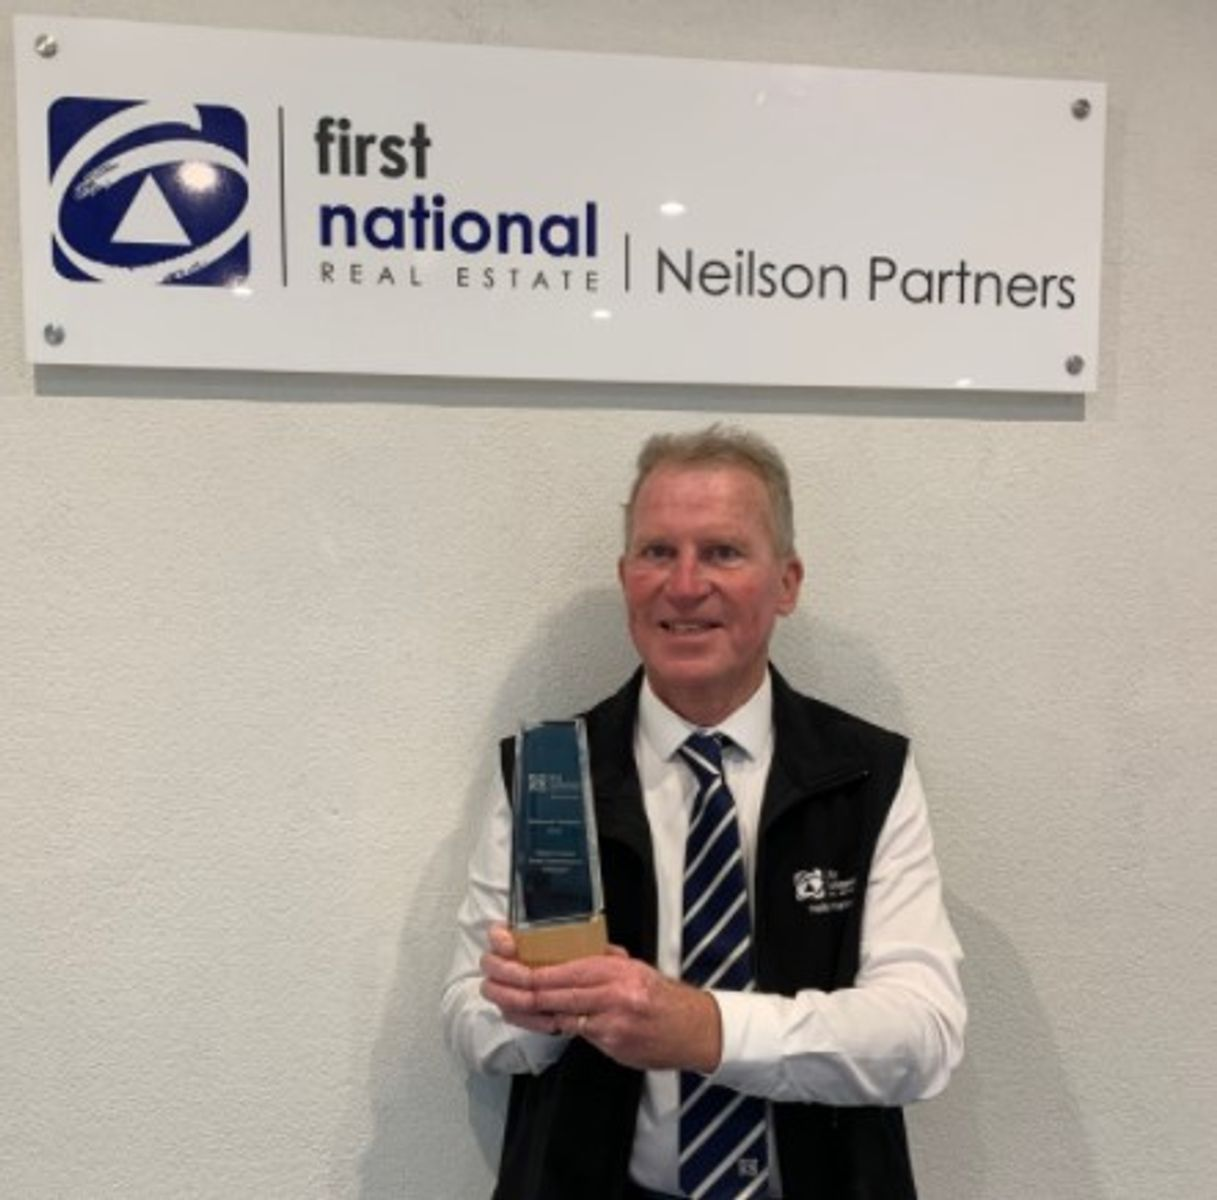 Nyall Greene with his Lifestyle Award